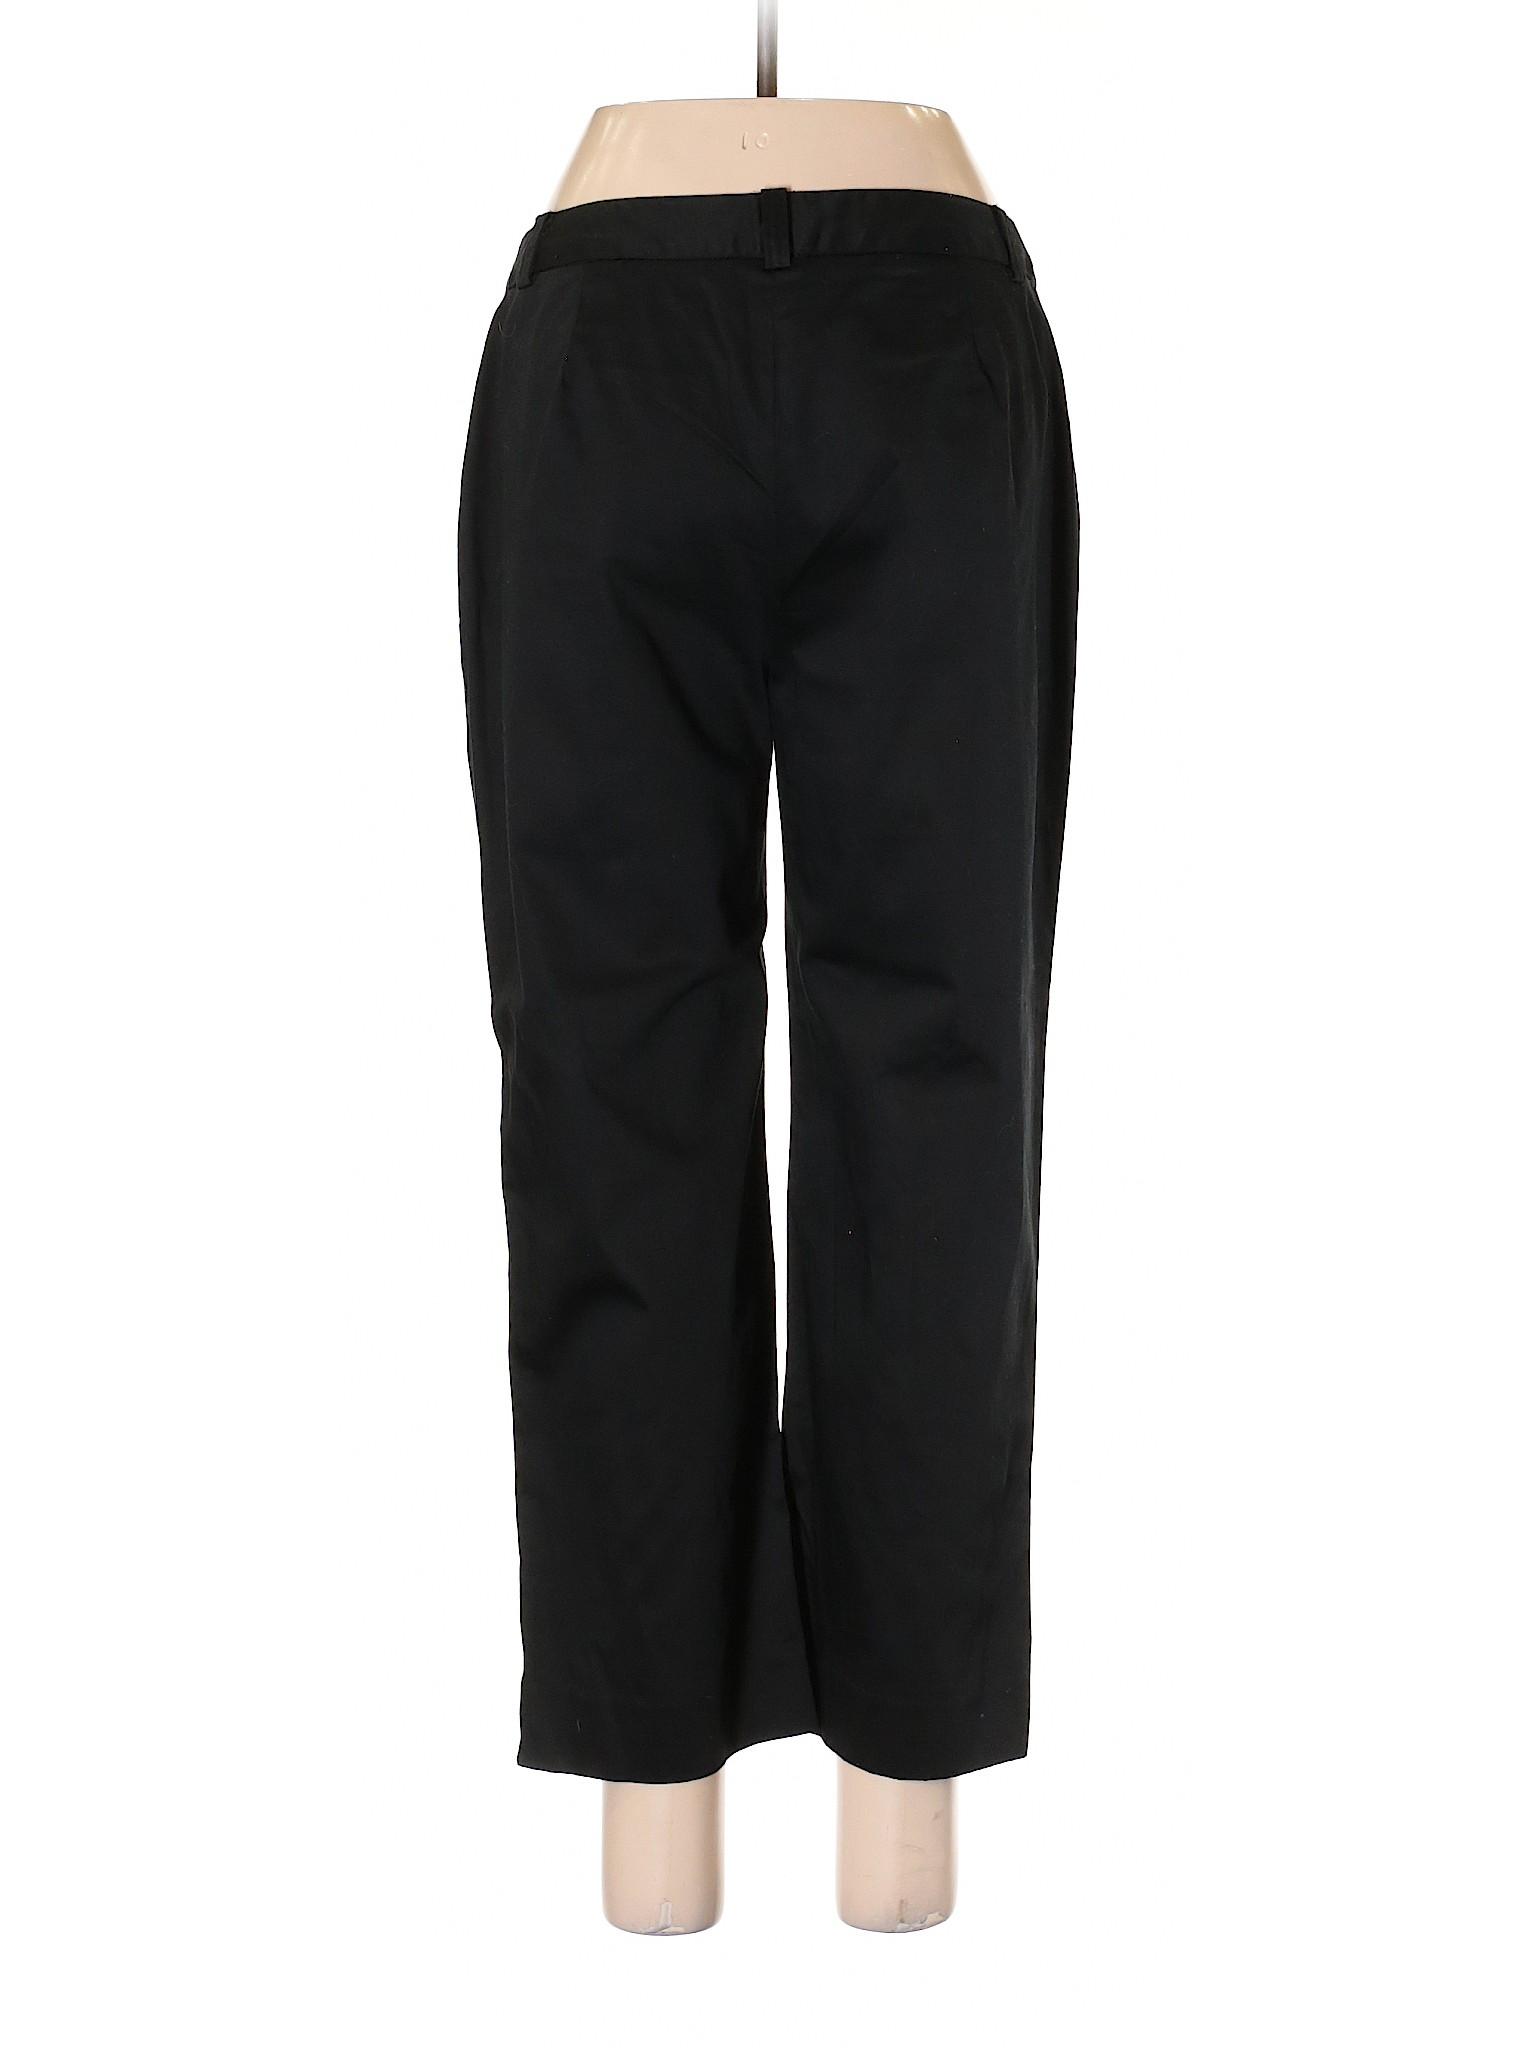 Dress Leisure York Boutique Signature Pants New Jones xOqxdpX